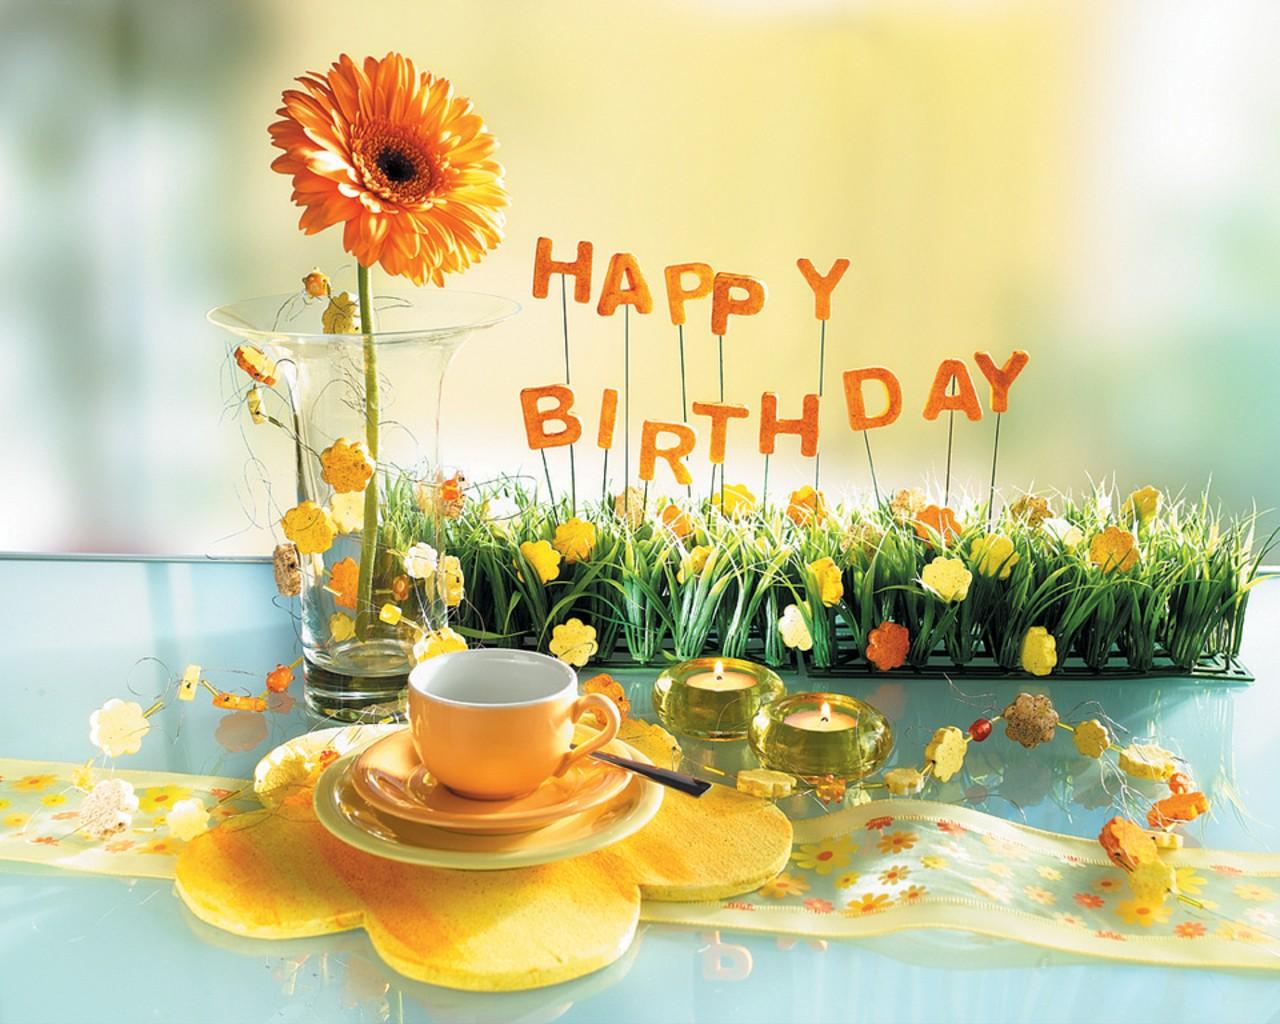 happy birthday wallpaper size 1280 1024 happy birthday wallpaper for 1280x1024